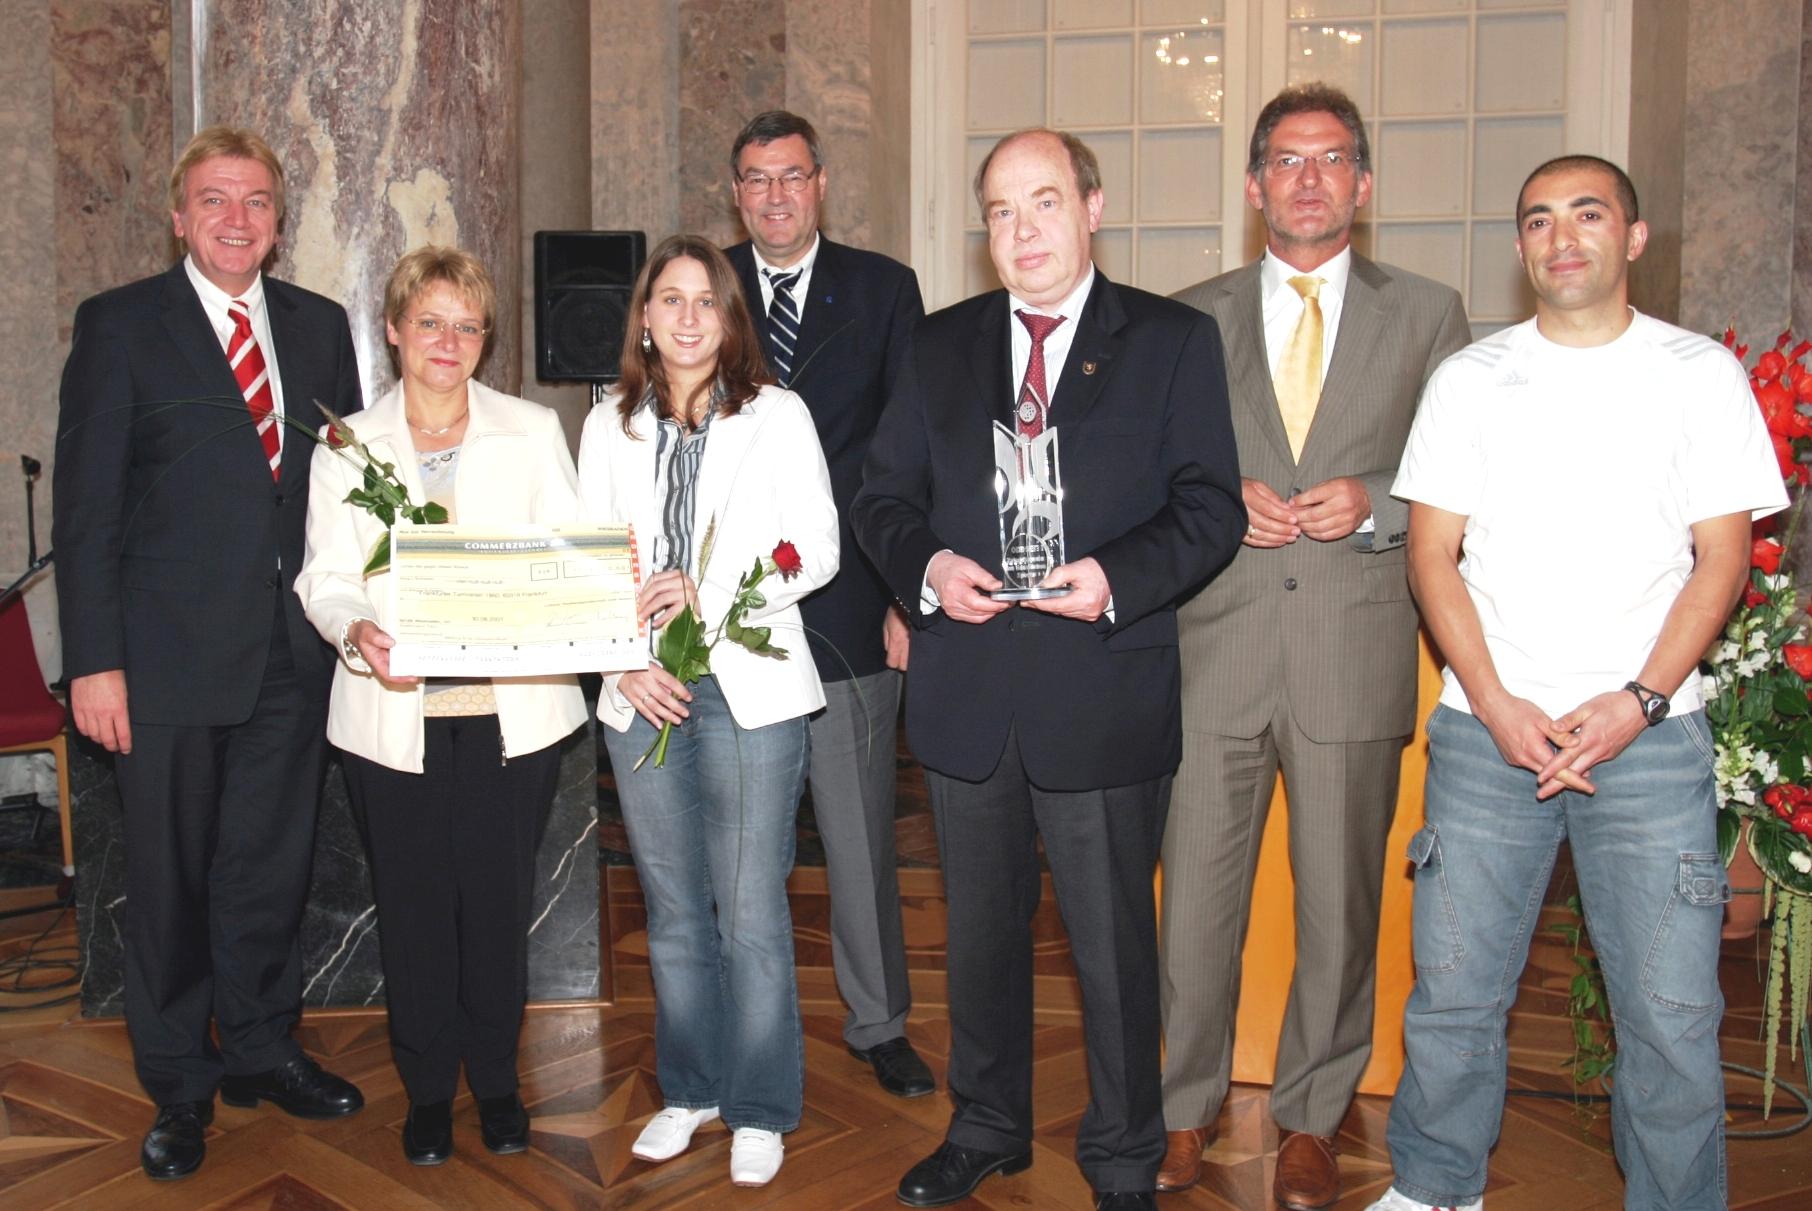 Oddset-Preisverleihung 2007